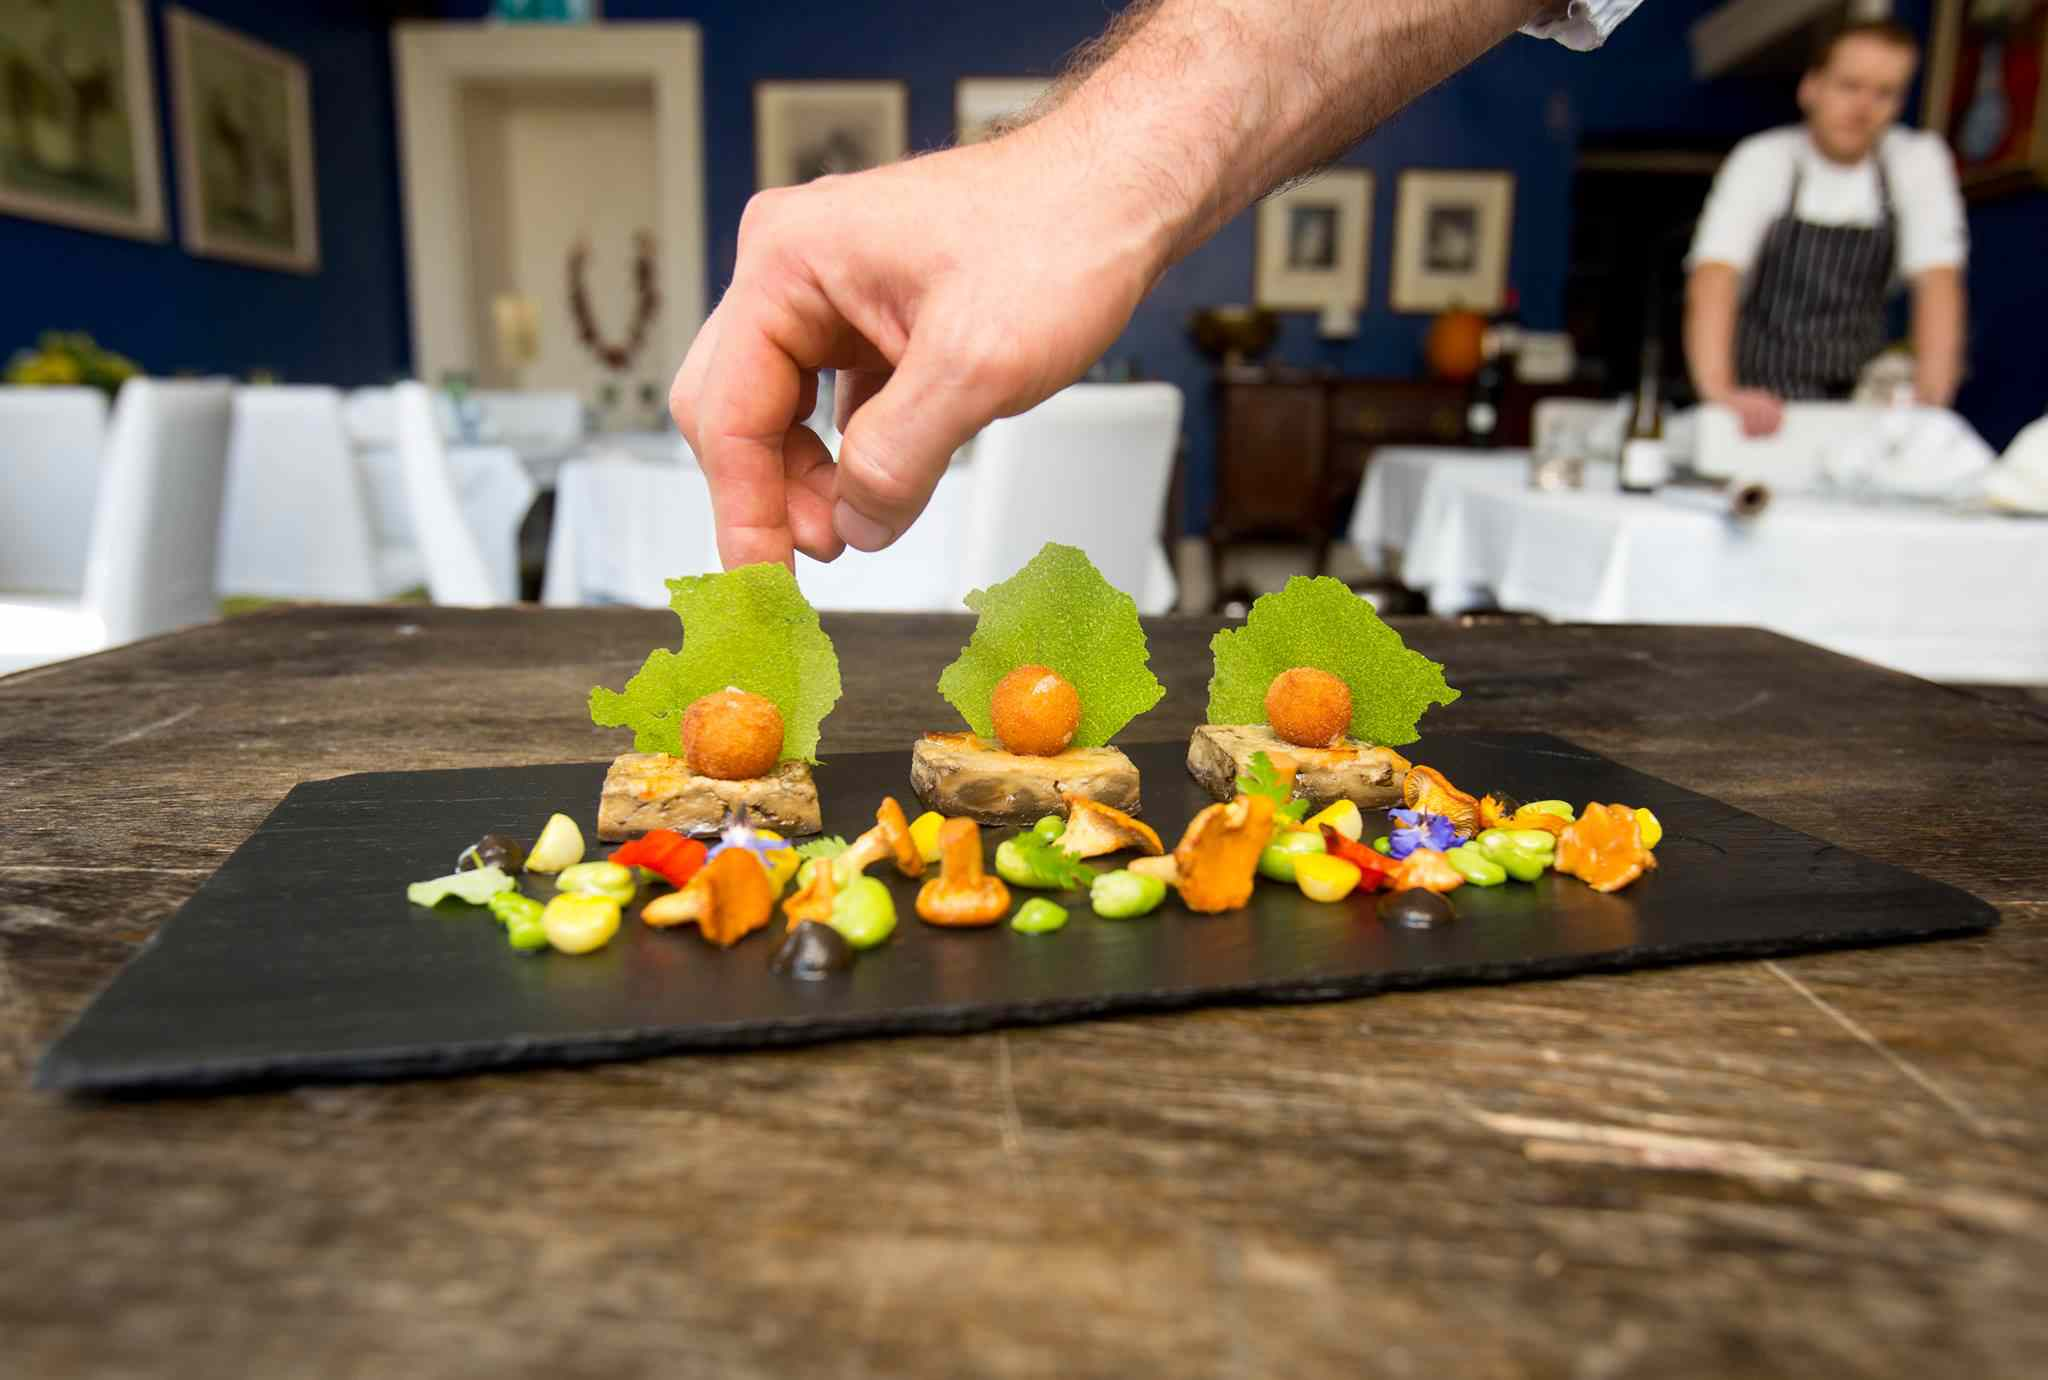 Hand placing green garnish on slate plate